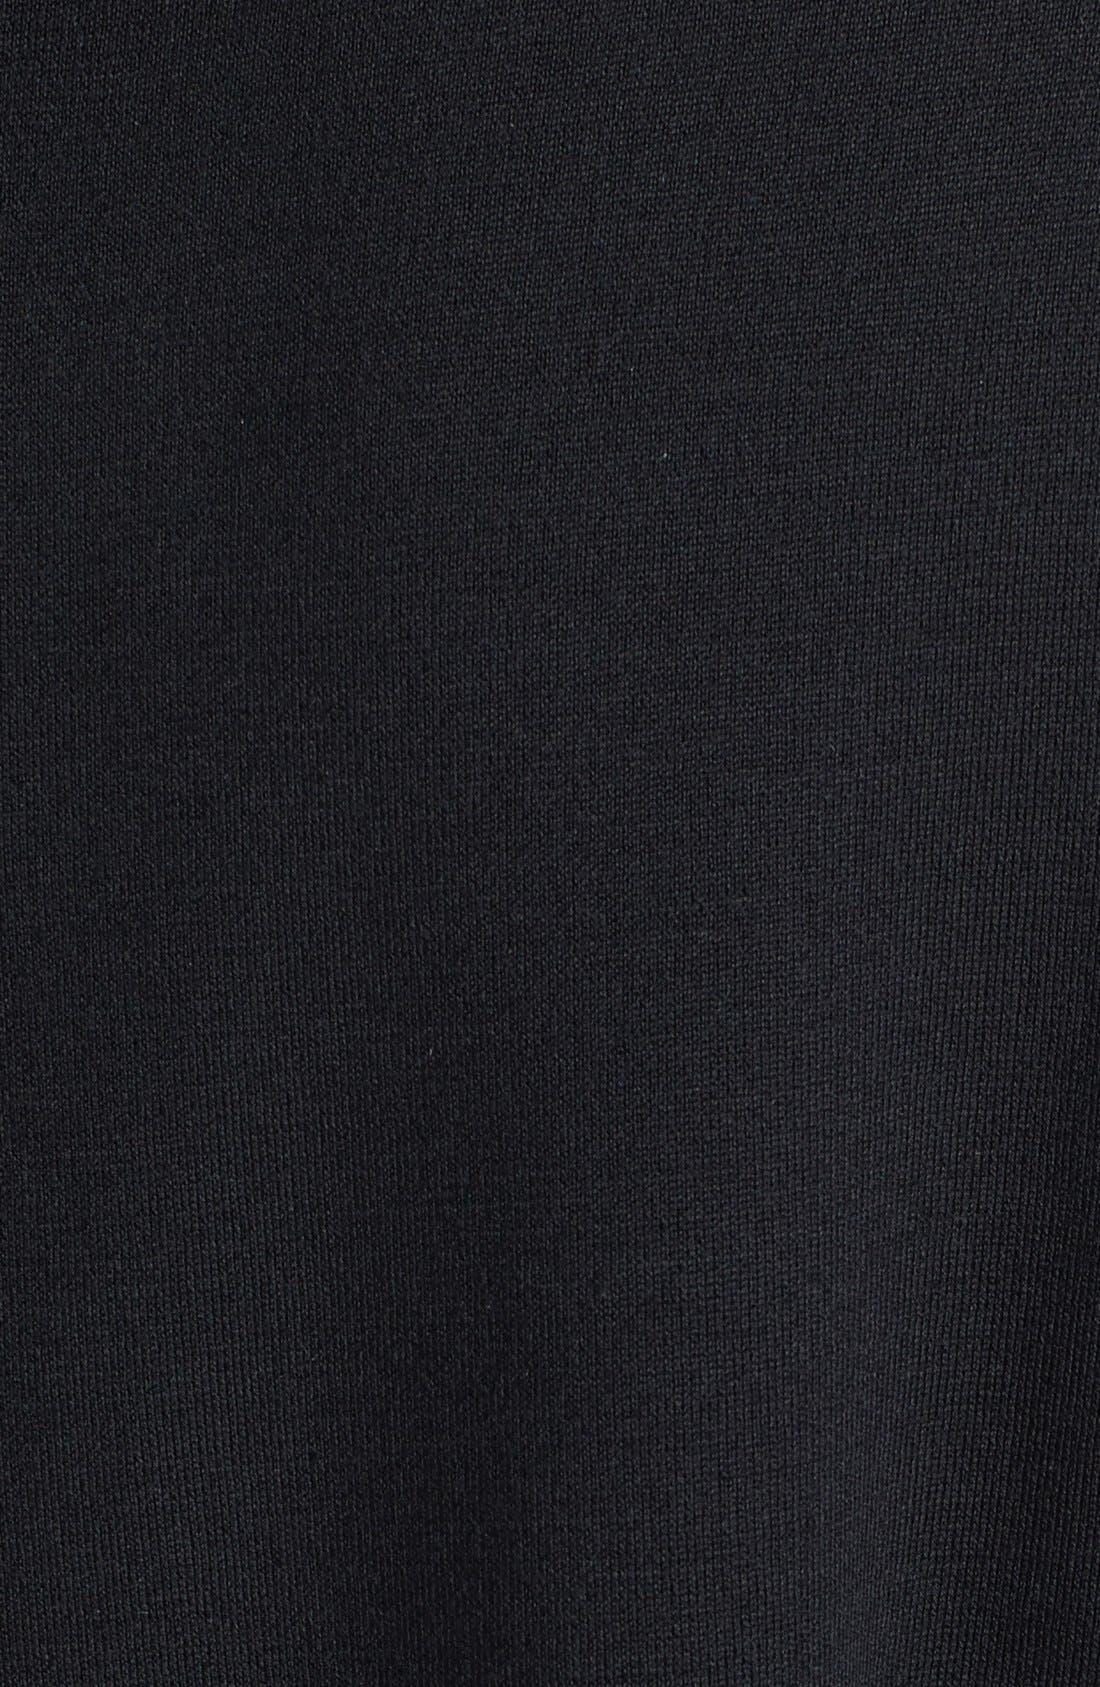 Alternate Image 3  - St. John Collection Bead Embellished Milano Knit Tunic